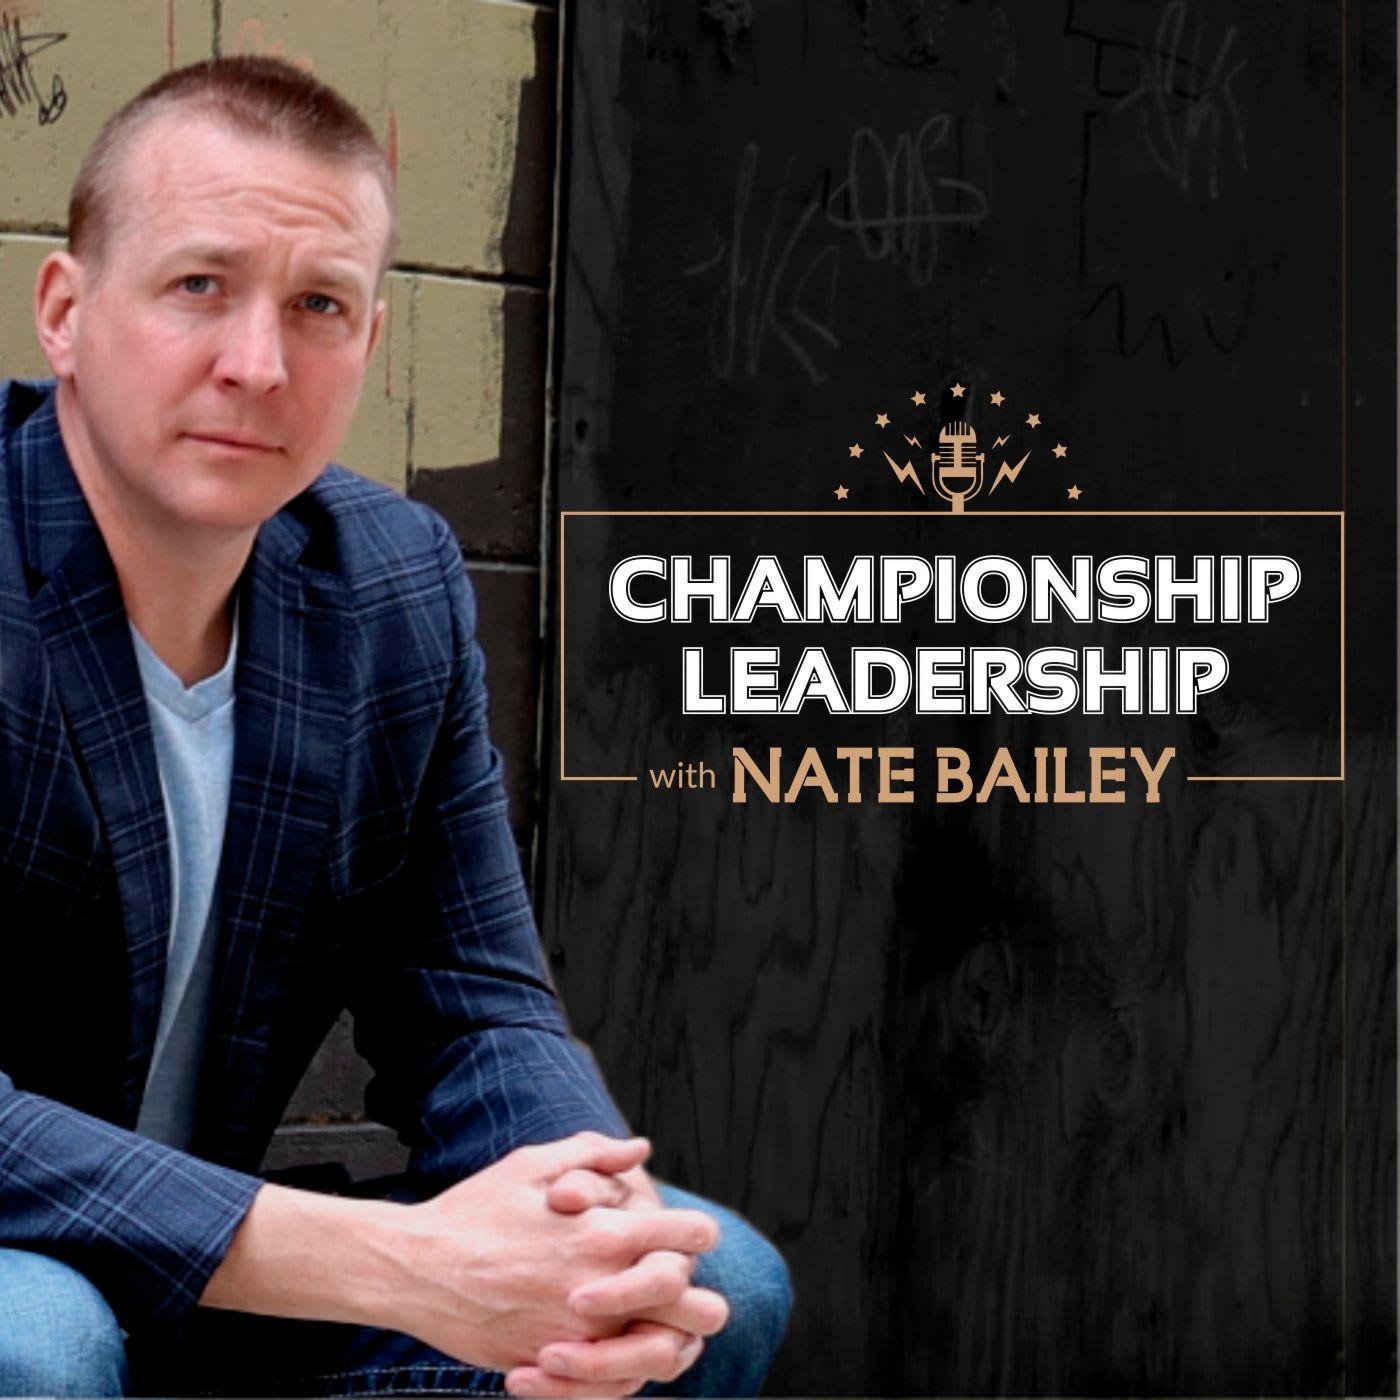 Nate Bailey